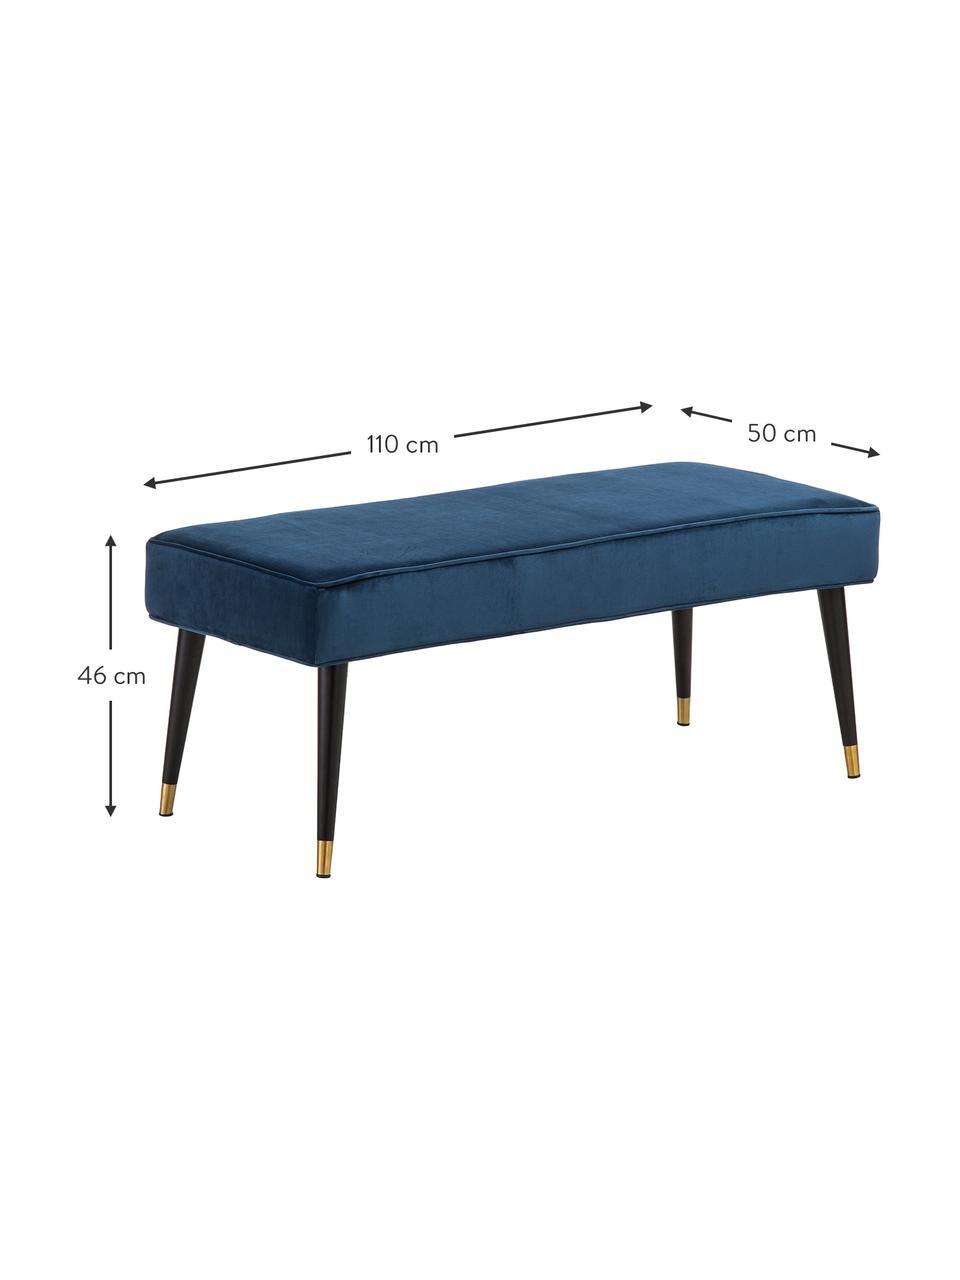 Samt-Sitzbank Beverly, Bezug: Samt (Polyester) 50.000 S, Gestell: Eukalyptusholz, Beine: Metall, pulverbeschichtet, Dunkelblau, 110 x 46 cm